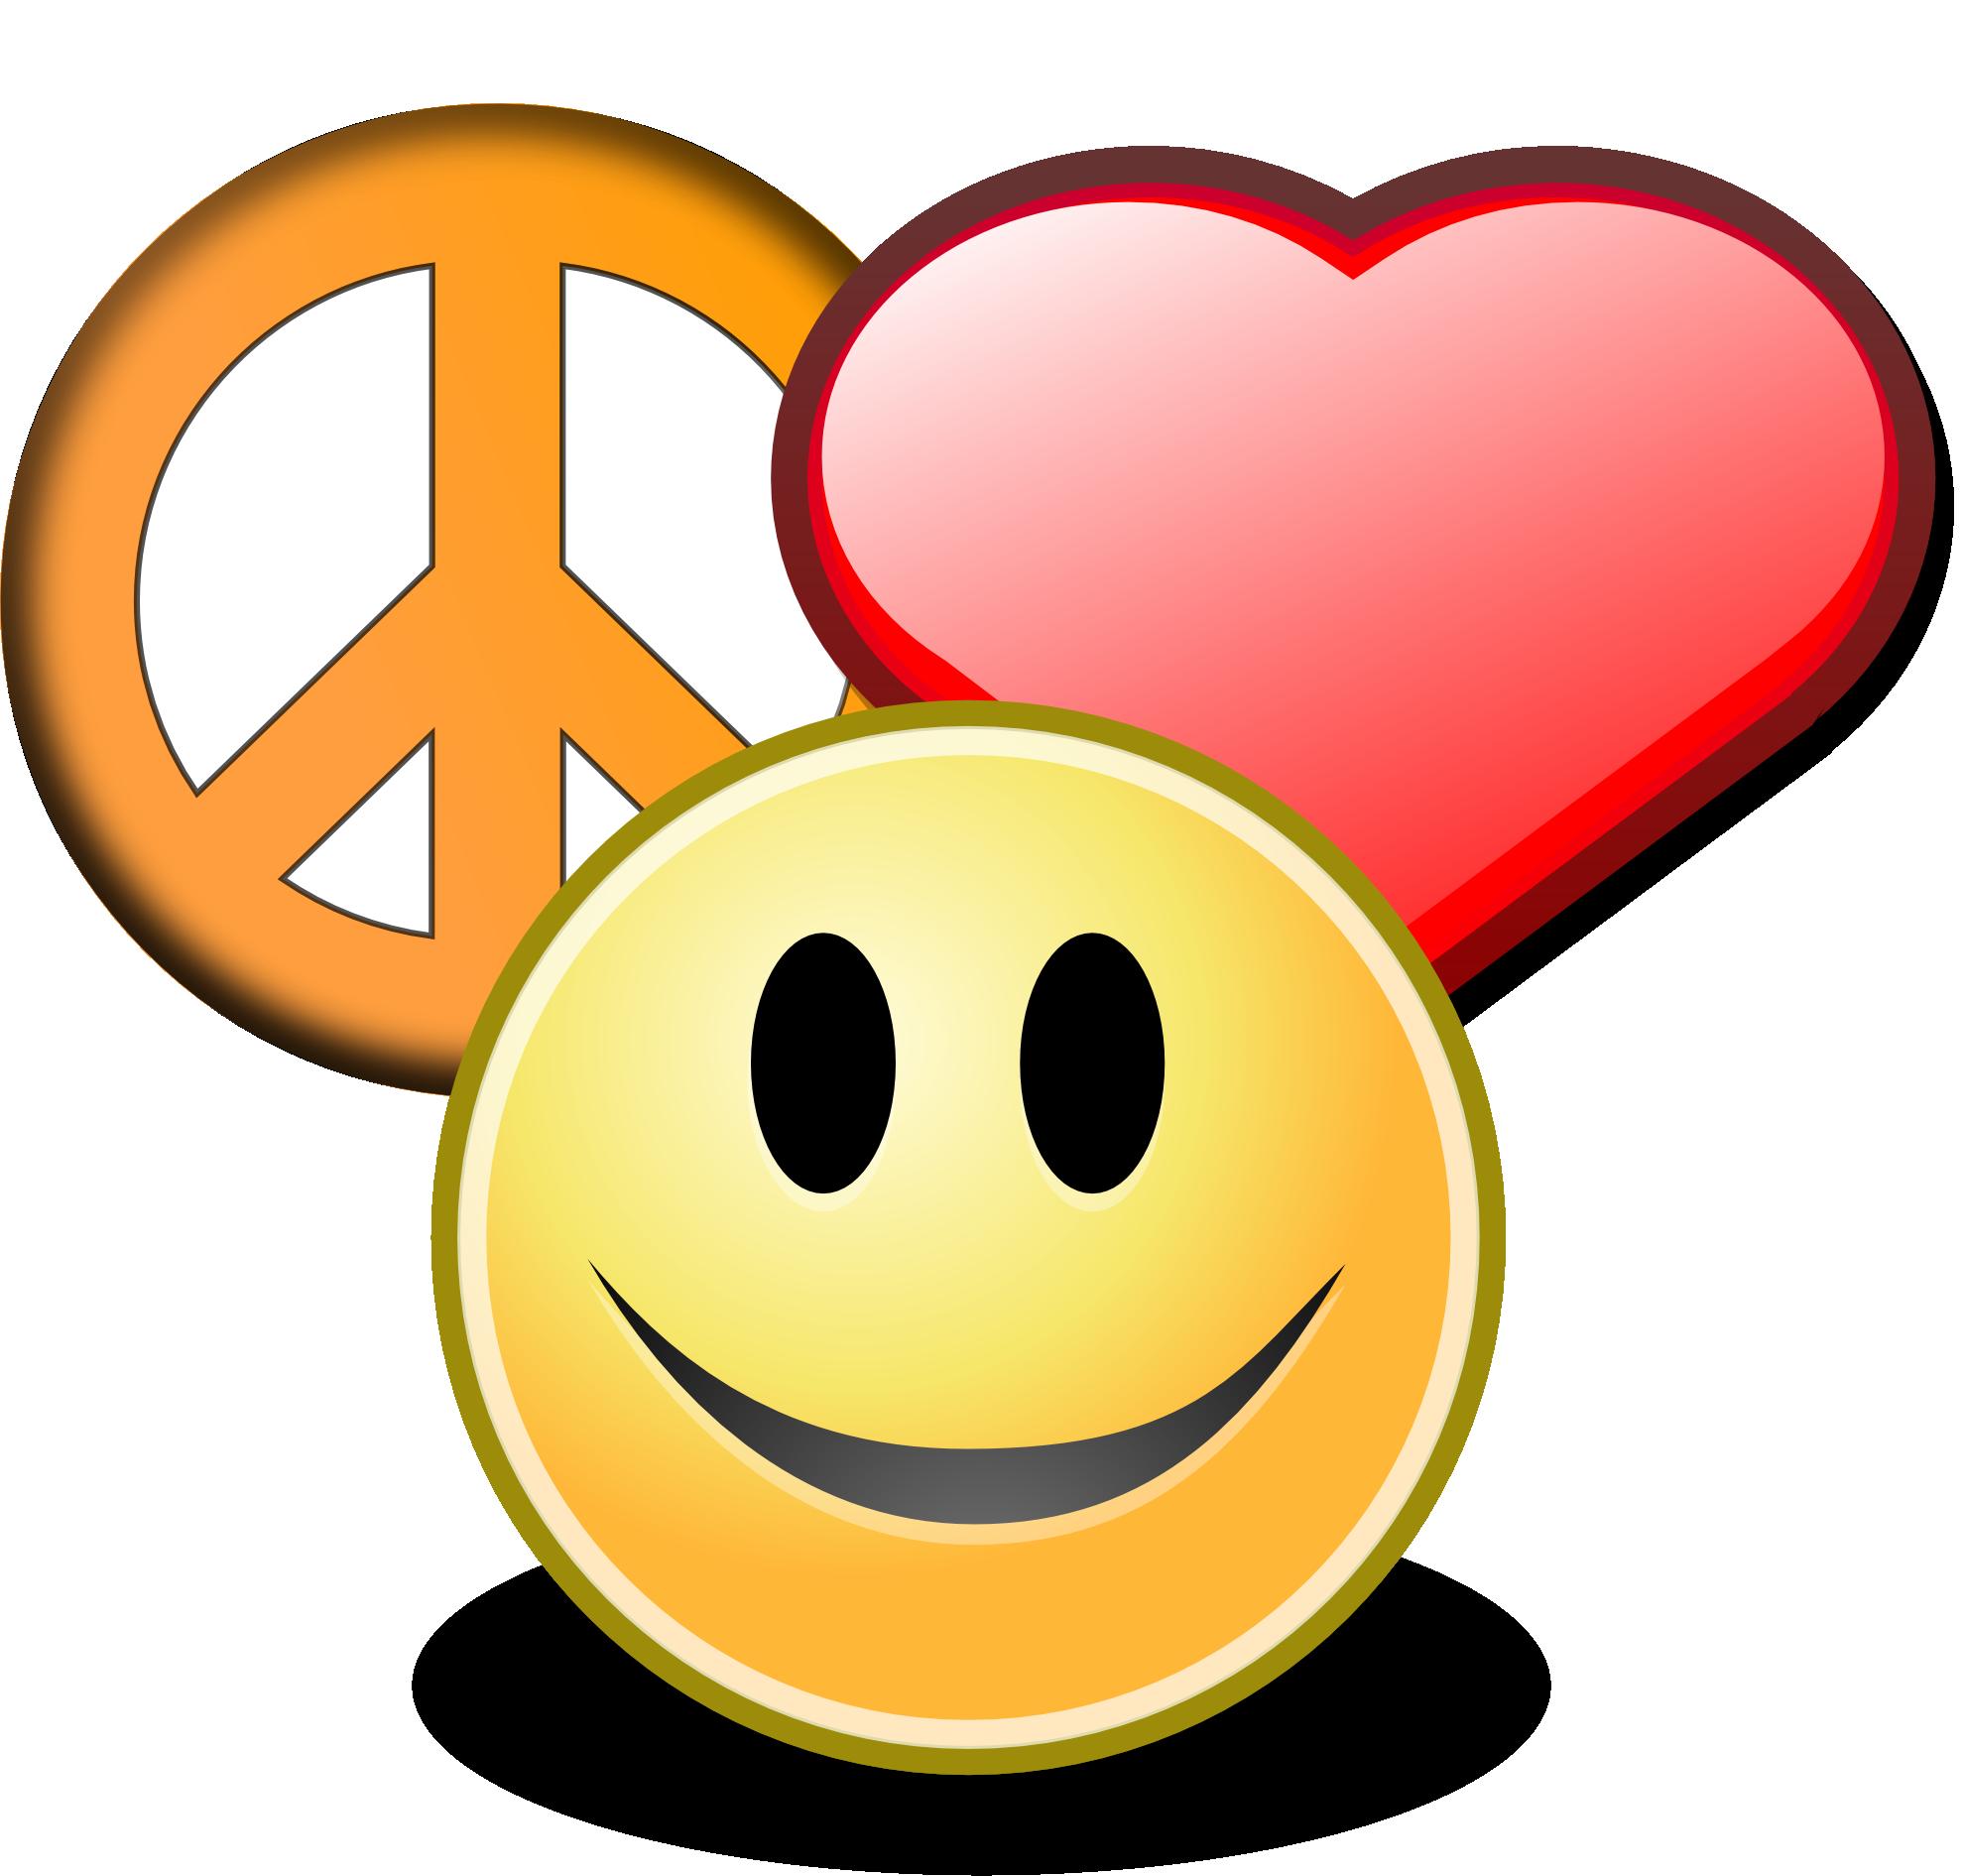 Happiness clipart citizen.  huge freebie download